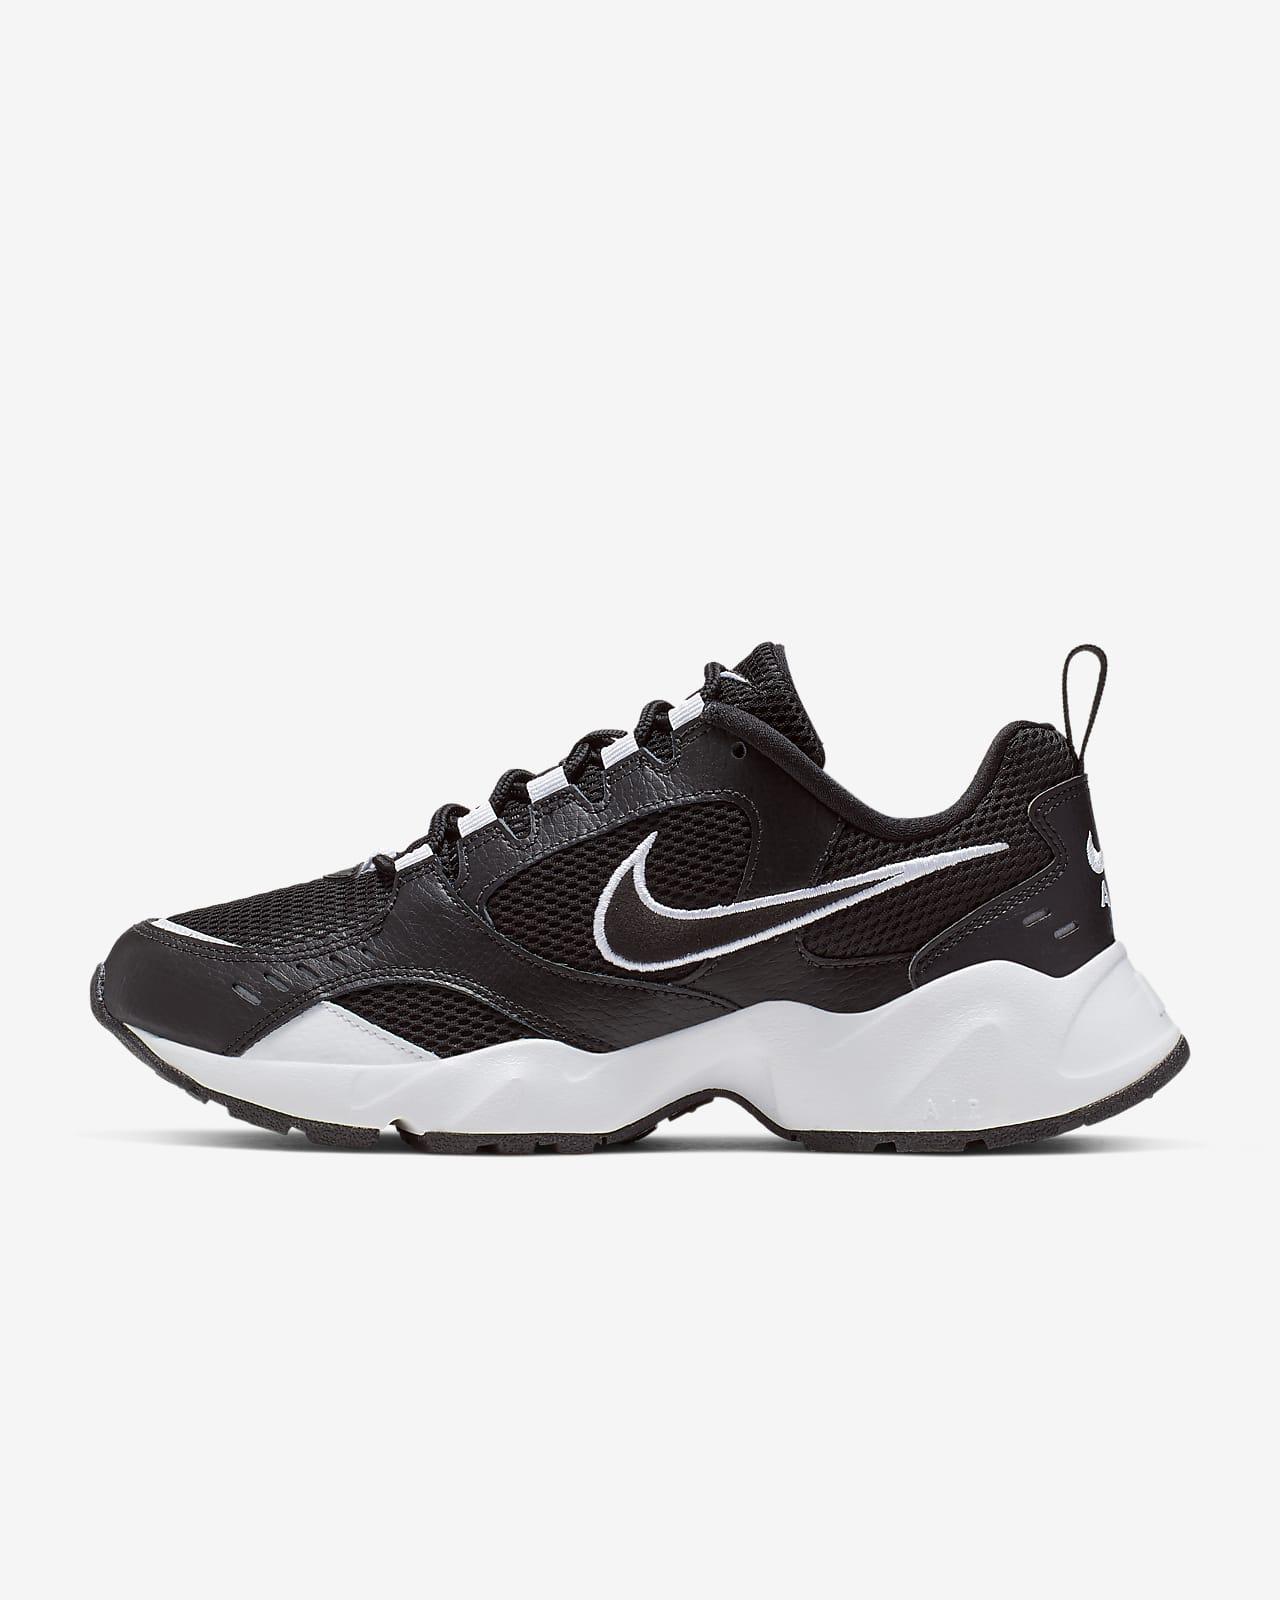 Fitness Sko Til Kvinder. Nike DK